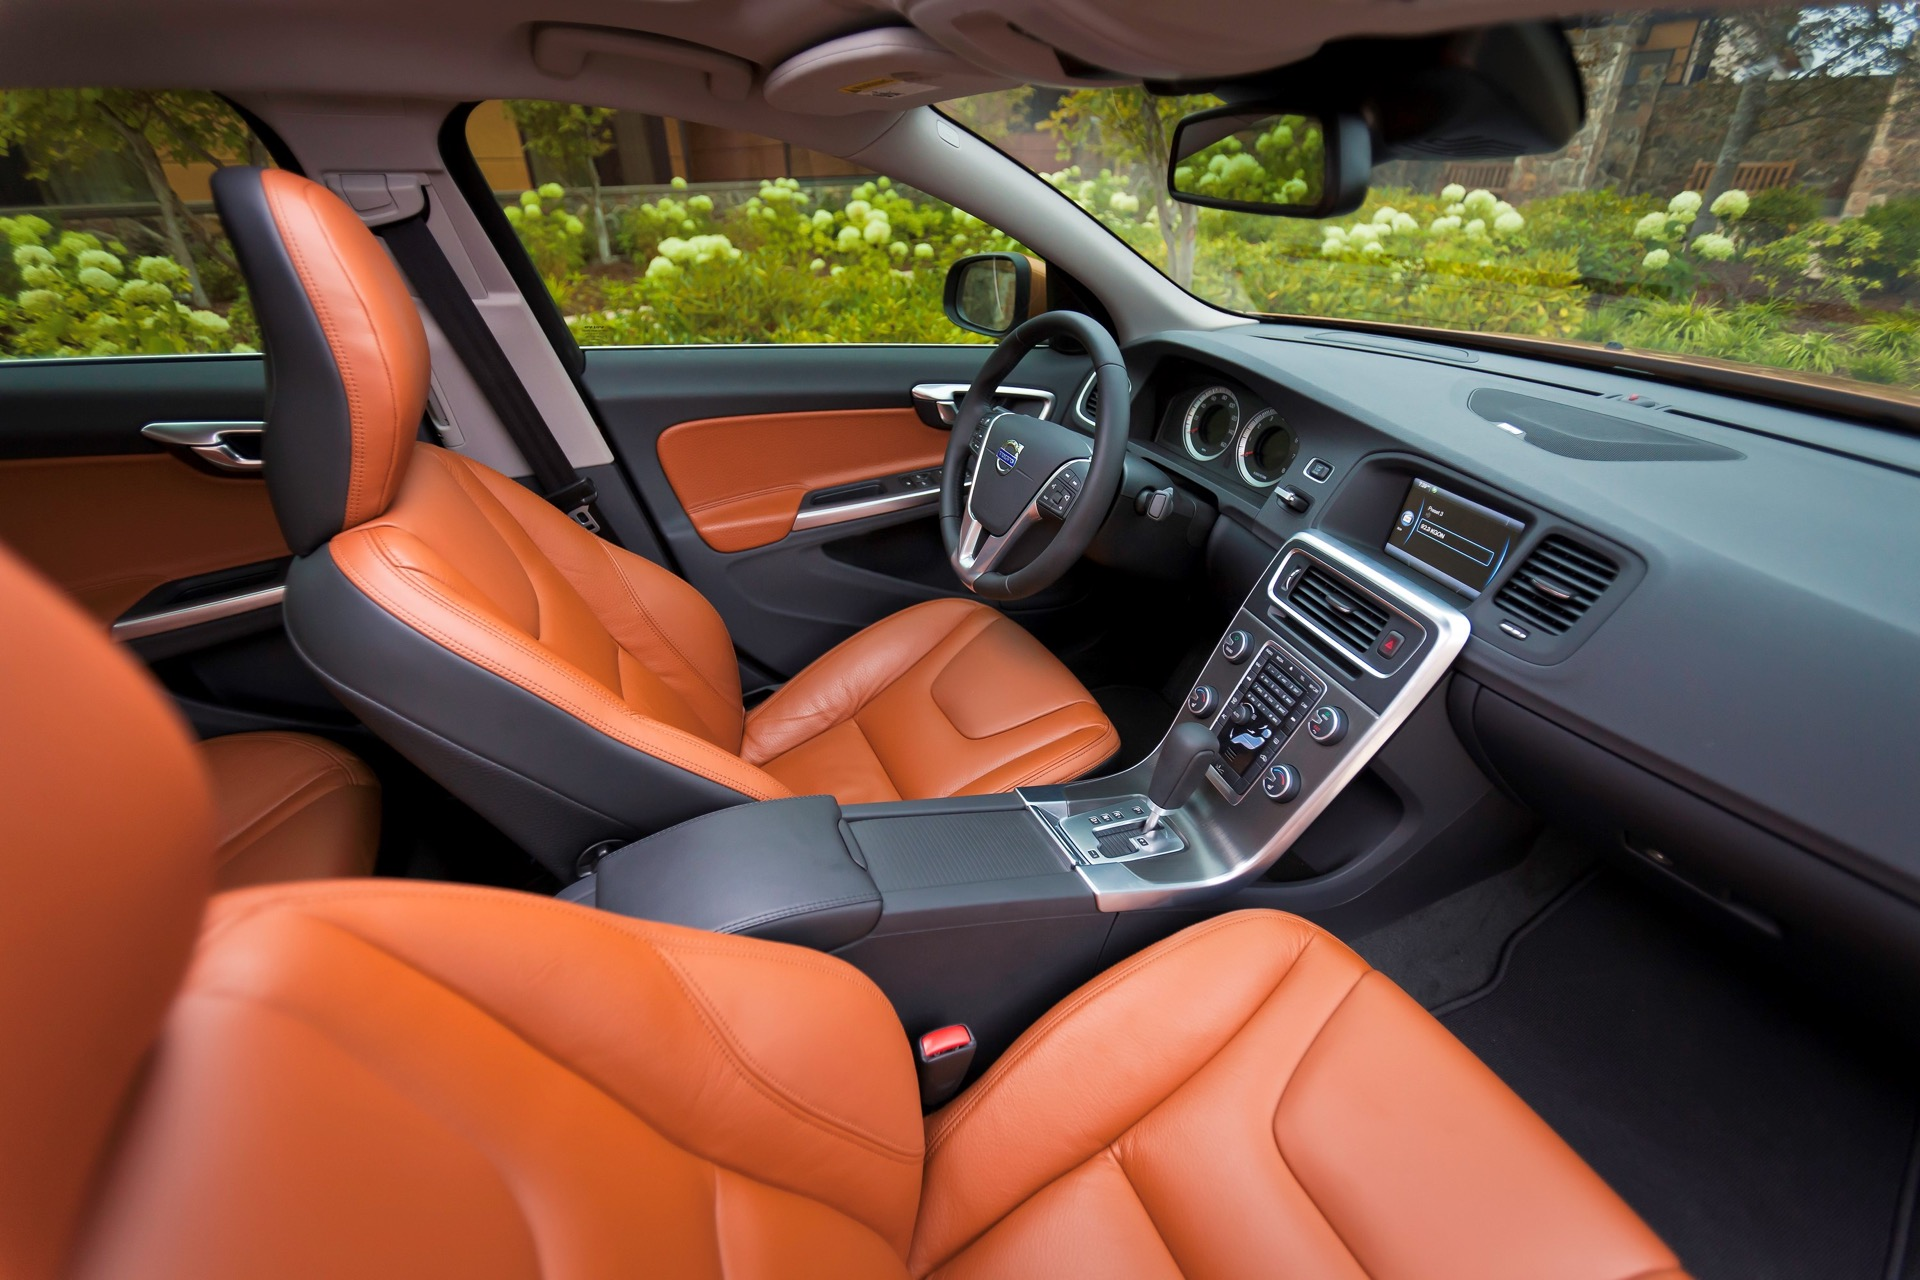 S60 T6 Awd Interior03 -  Volvo